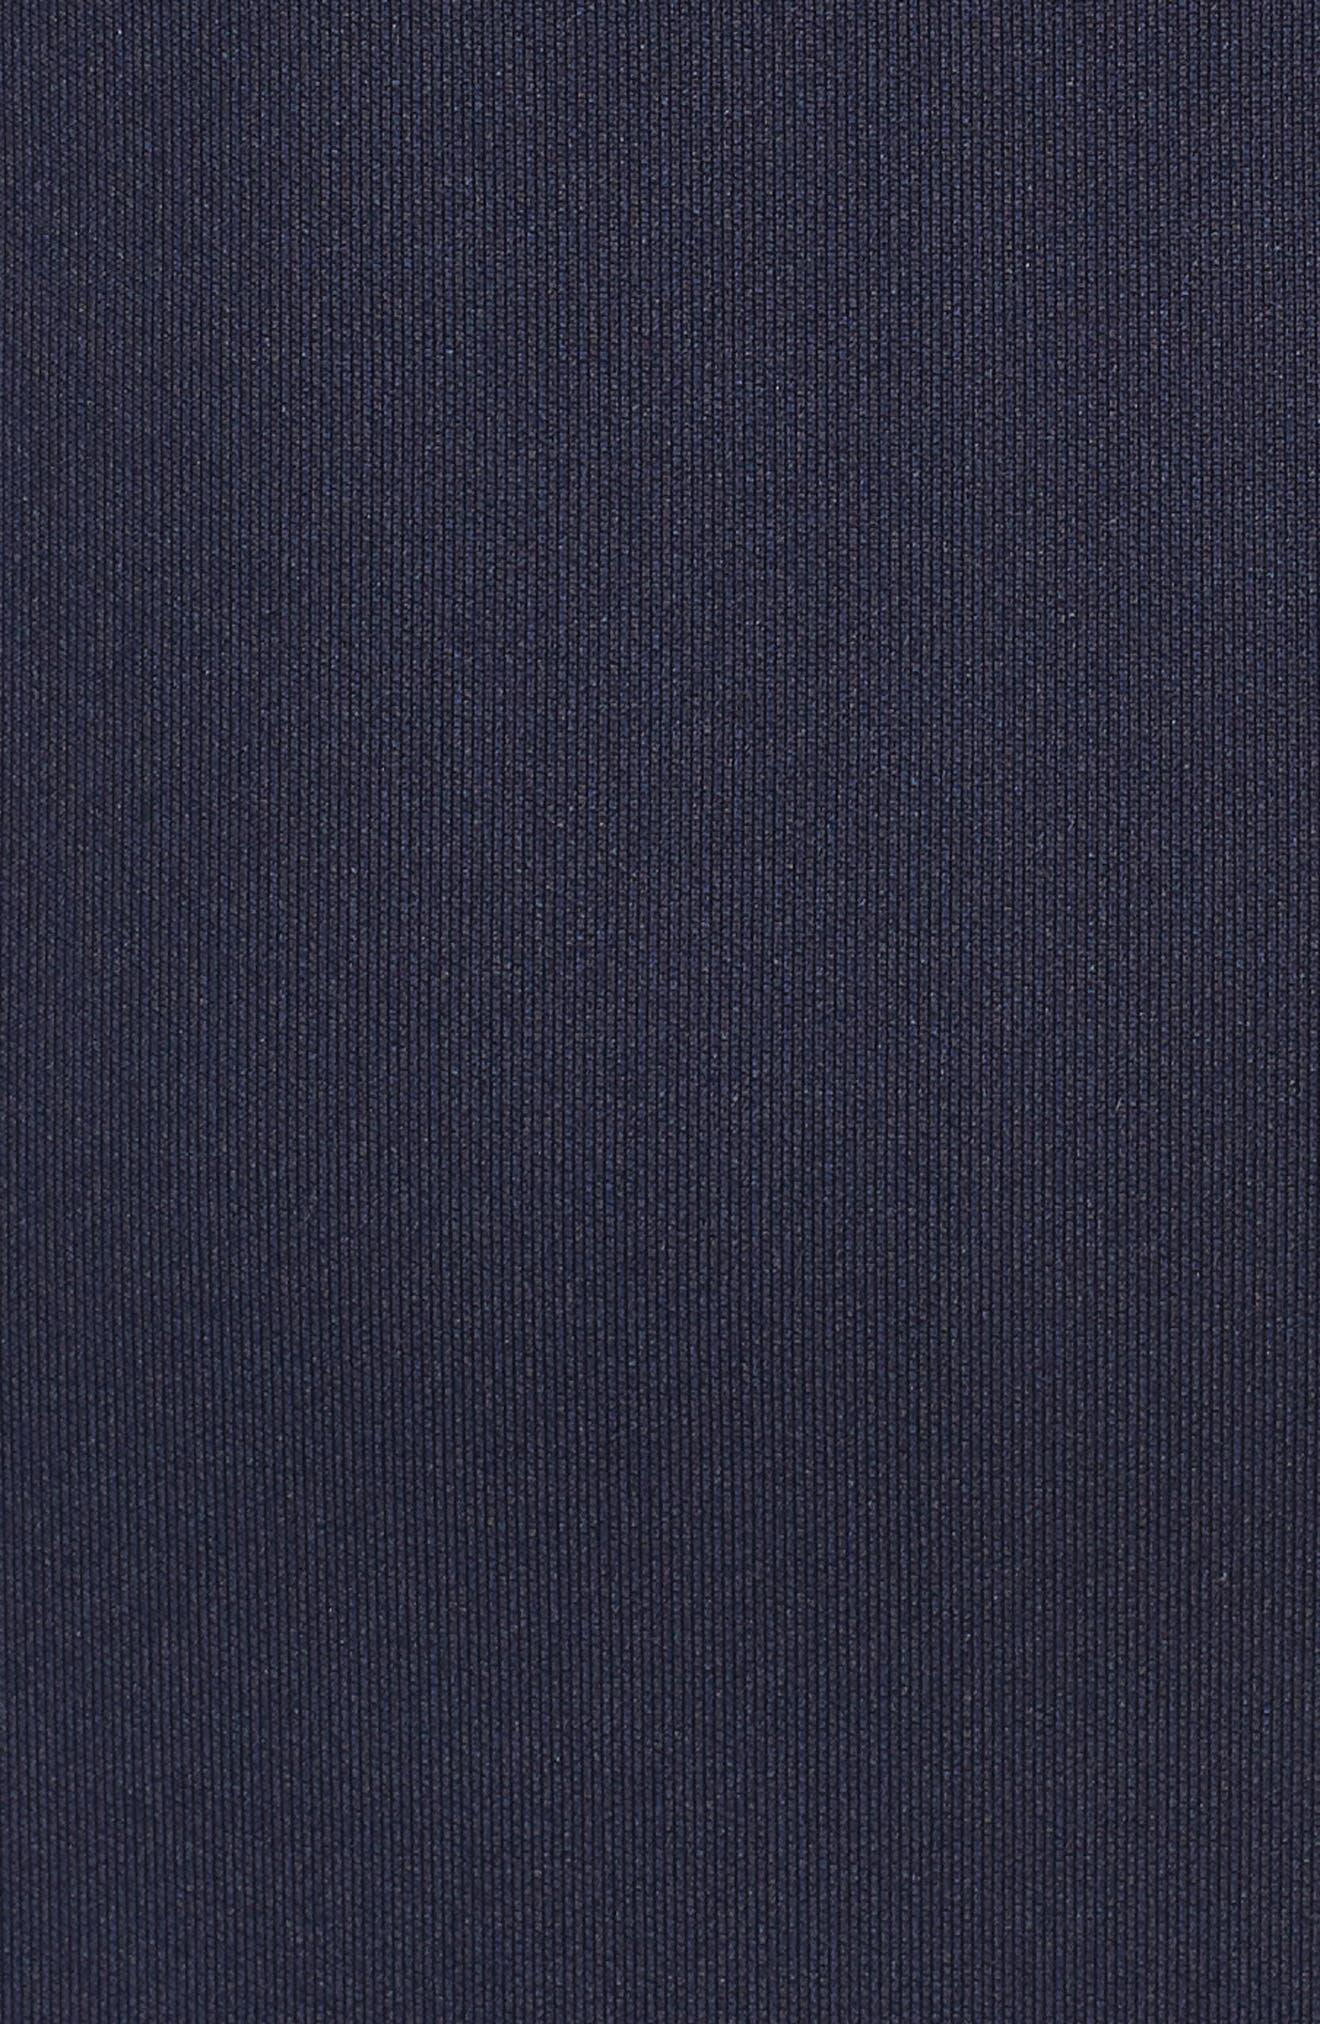 One-Shoulder Ruffle Sheath Dress,                             Alternate thumbnail 6, color,                             NAVY